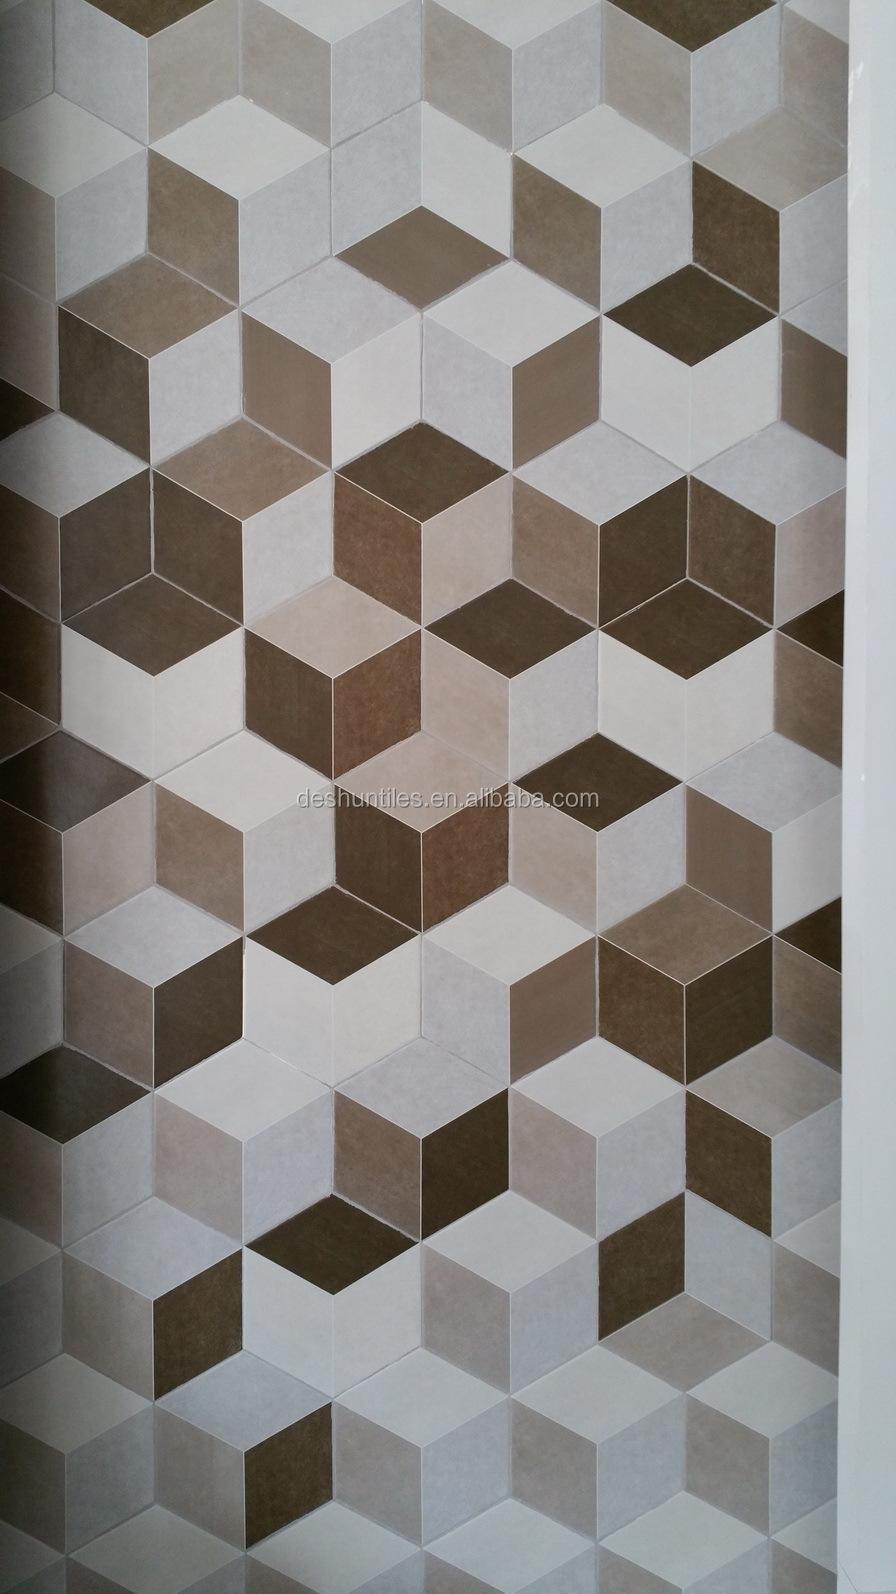 Pure colored hexagon mosaic tile art ceramic tiles for floor and pure colored hexagon mosaic tile art ceramic tiles for floor and wall dailygadgetfo Images